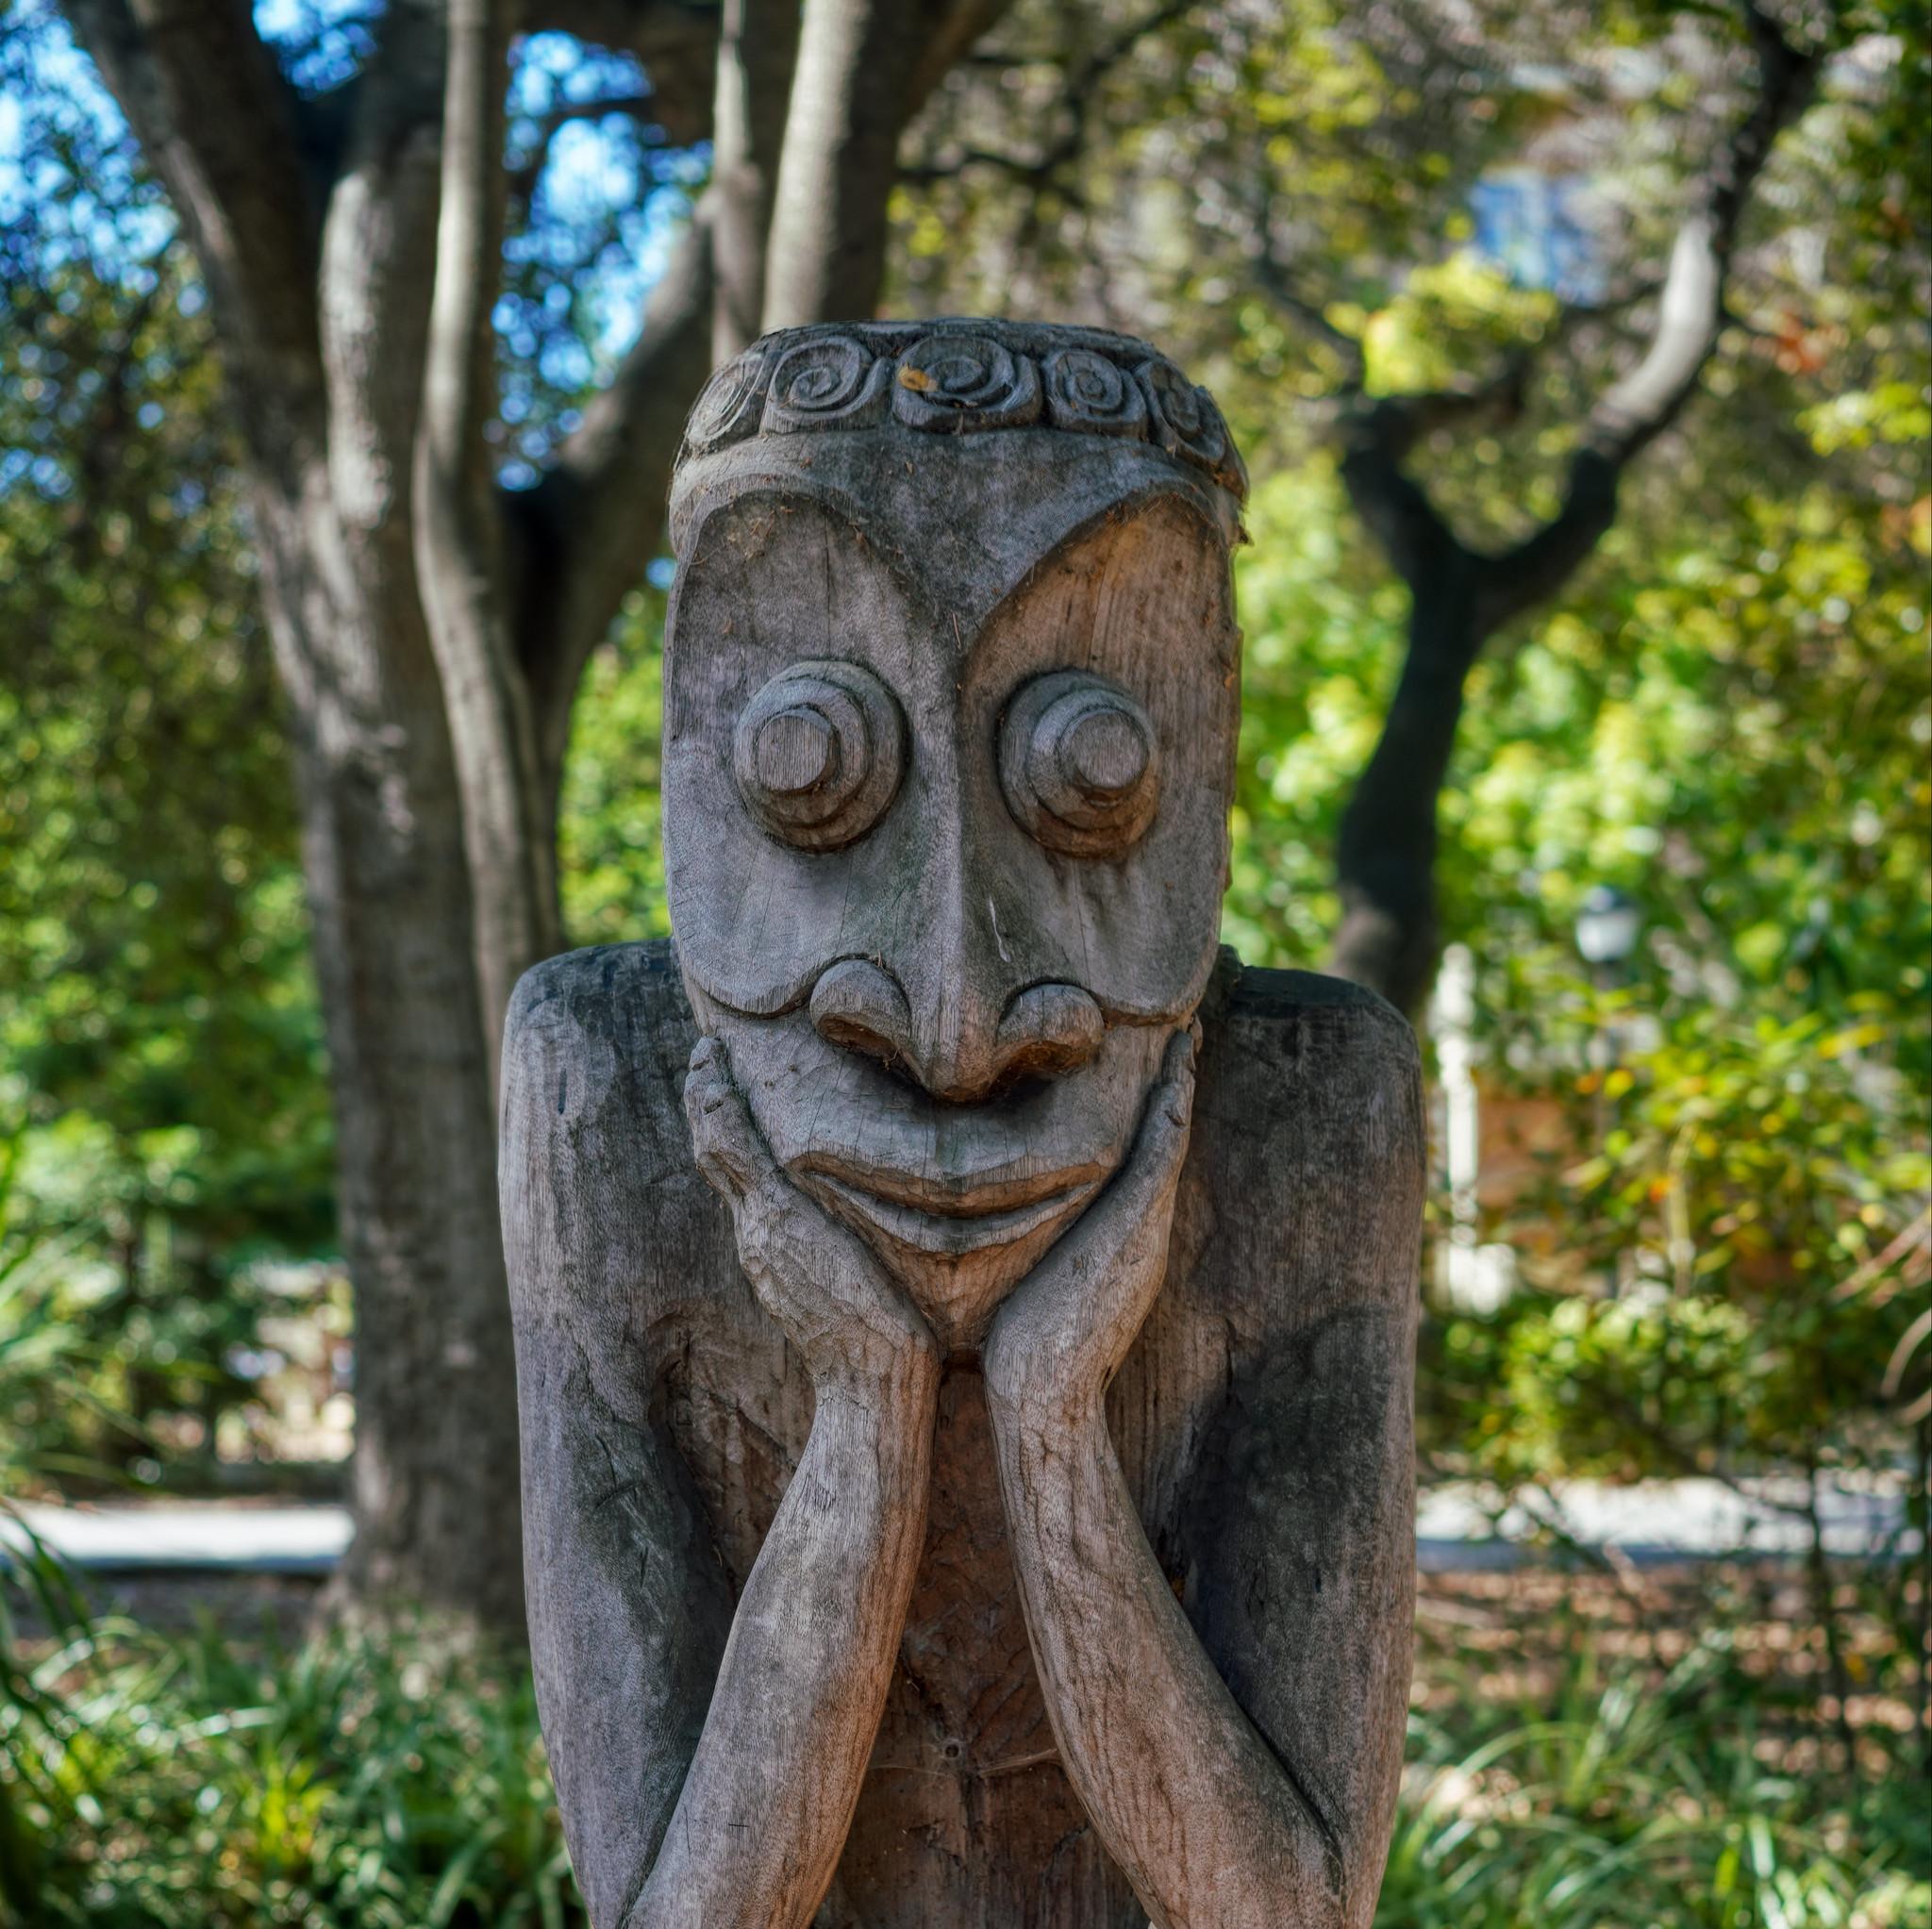 Wooden Statue Squatting